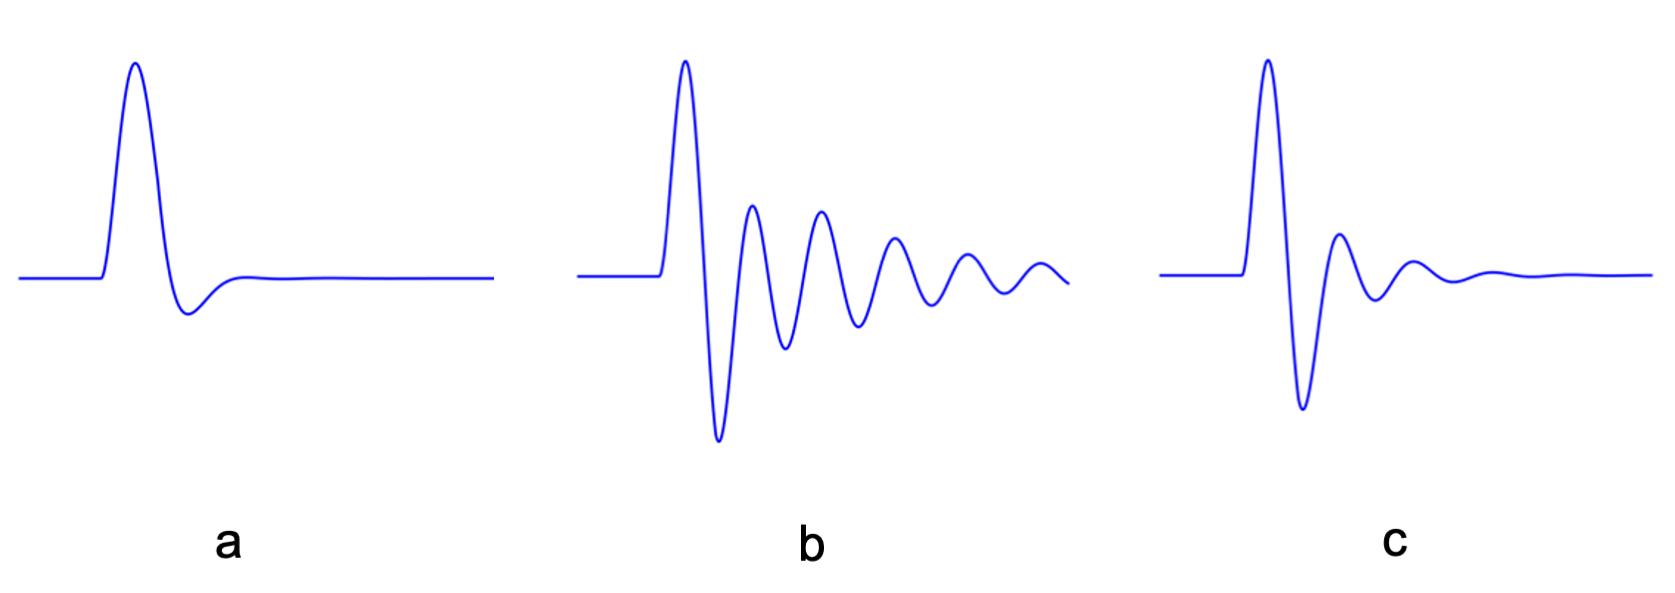 Figure 11.1. Simplified waveform diagrams showing three different kick drum profiles